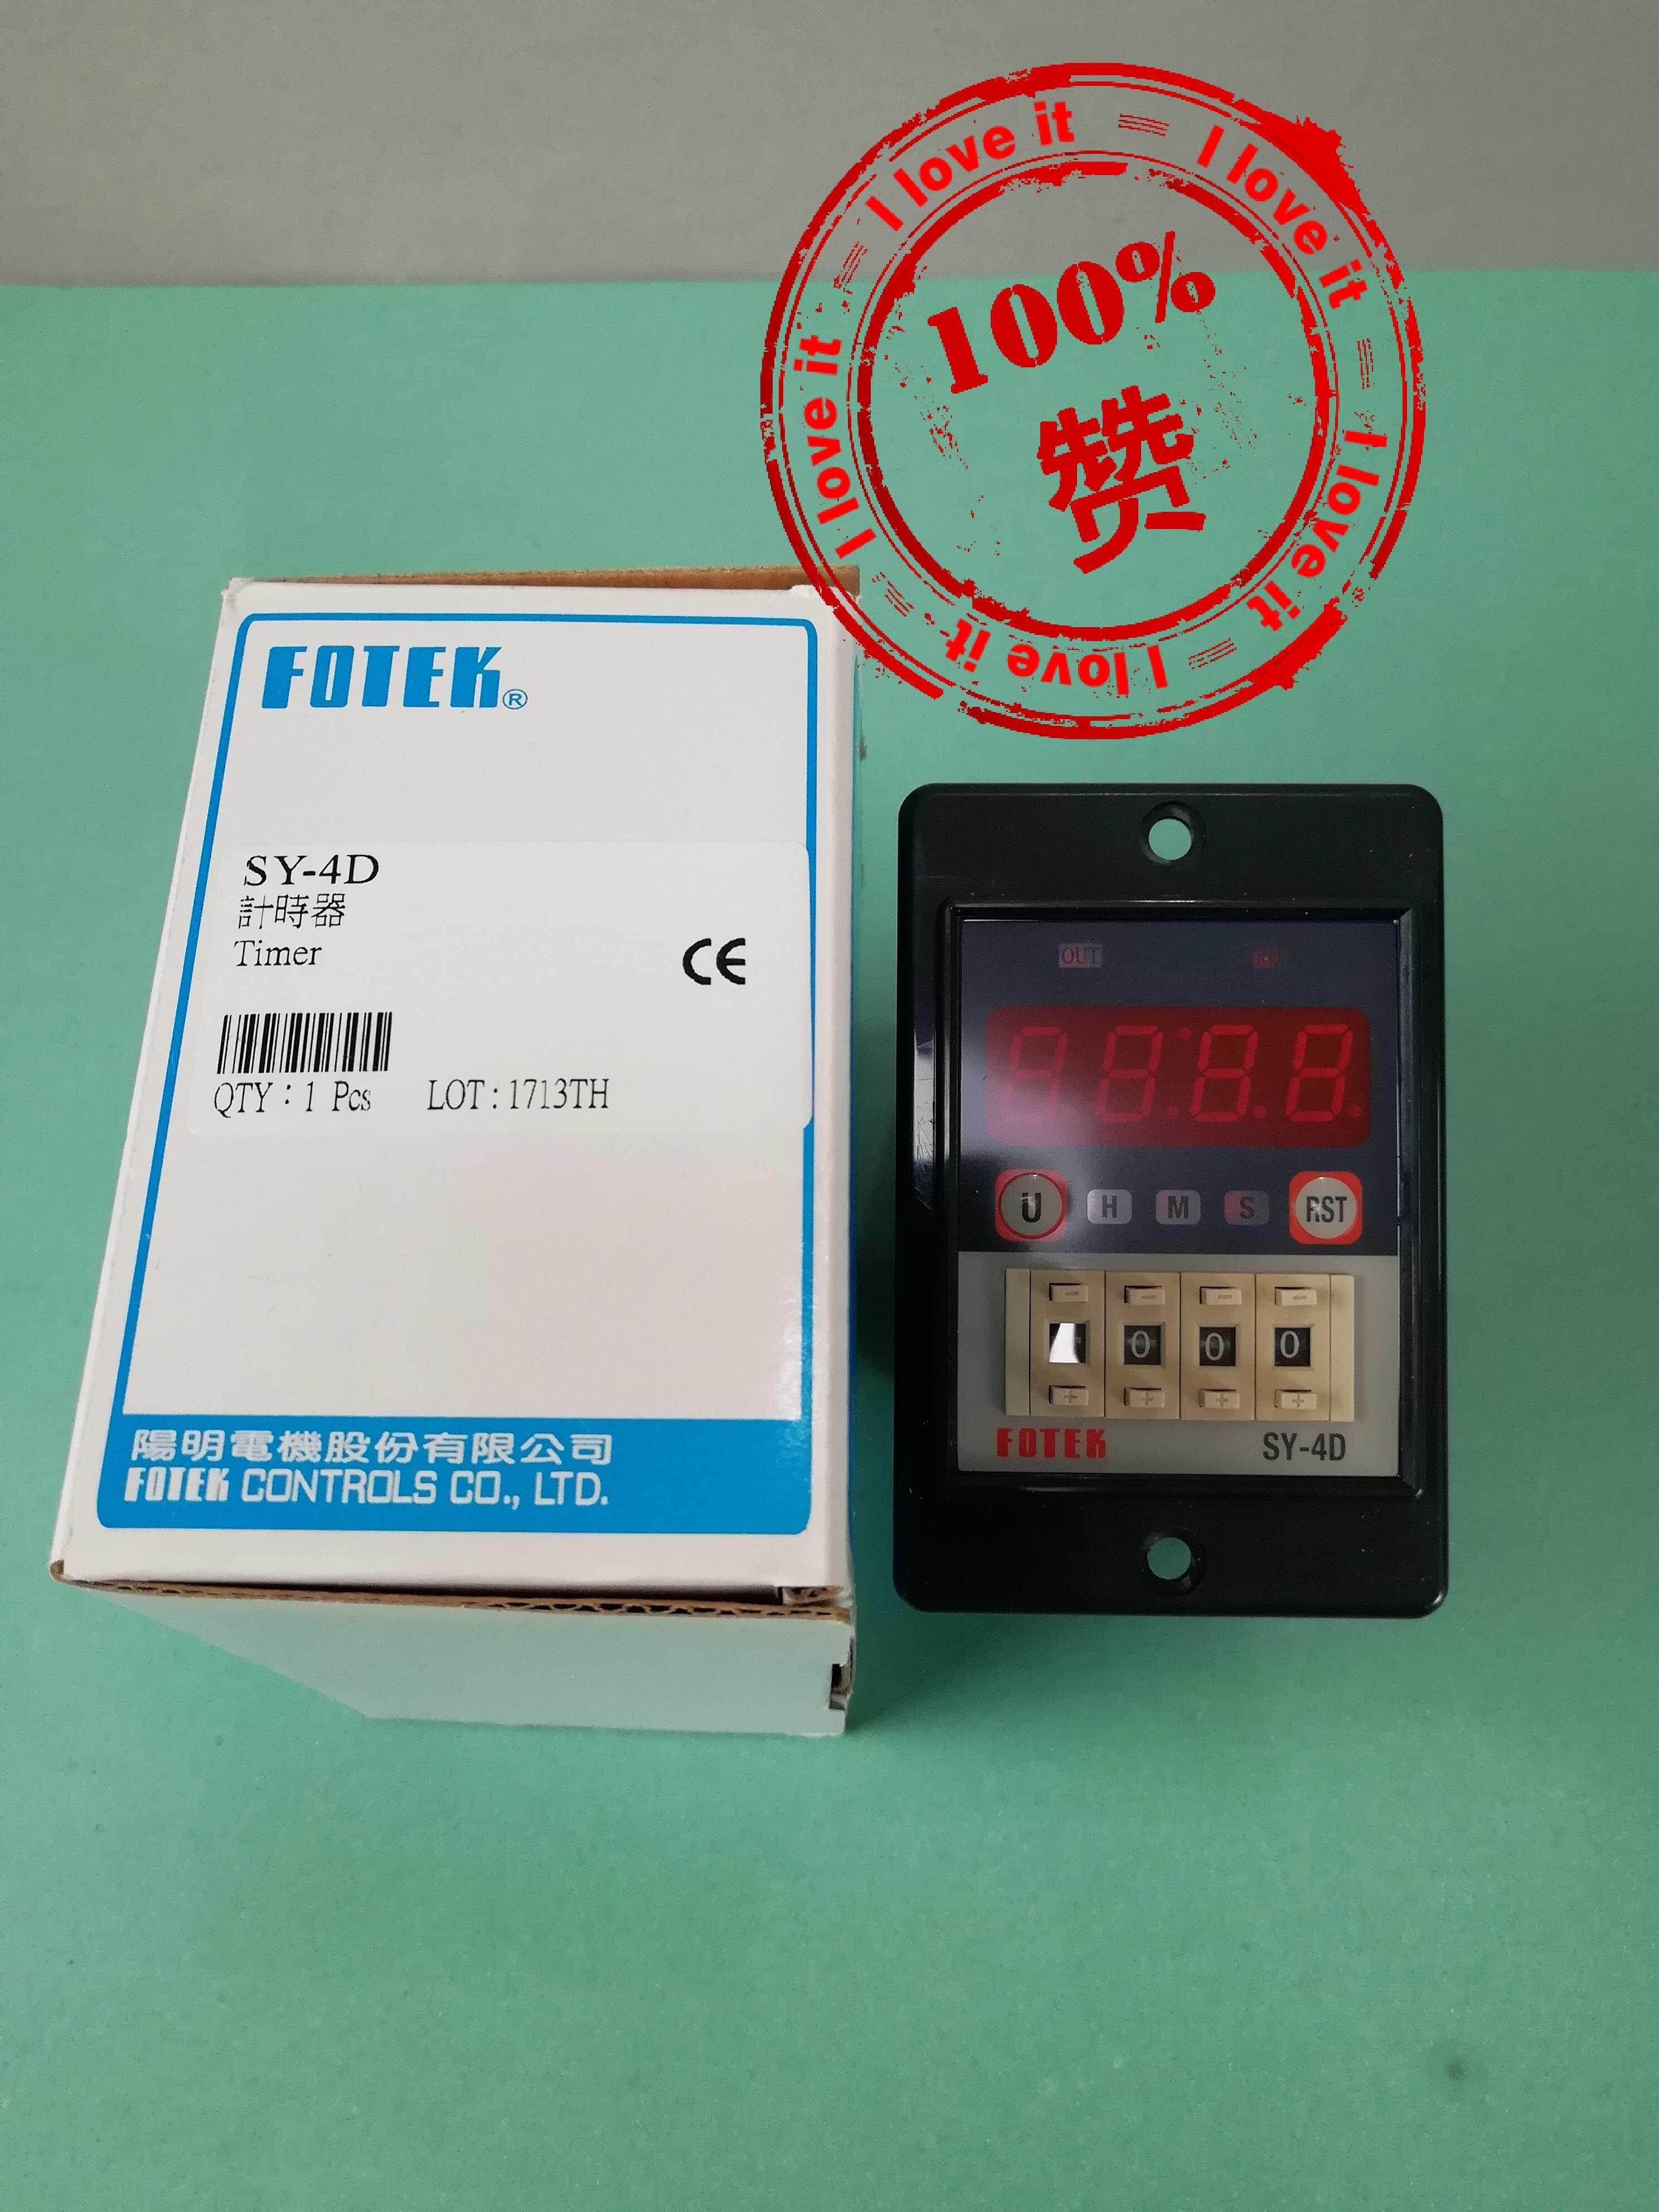 New Original Digital Display Delay Timer SY-4DNew Original Digital Display Delay Timer SY-4D